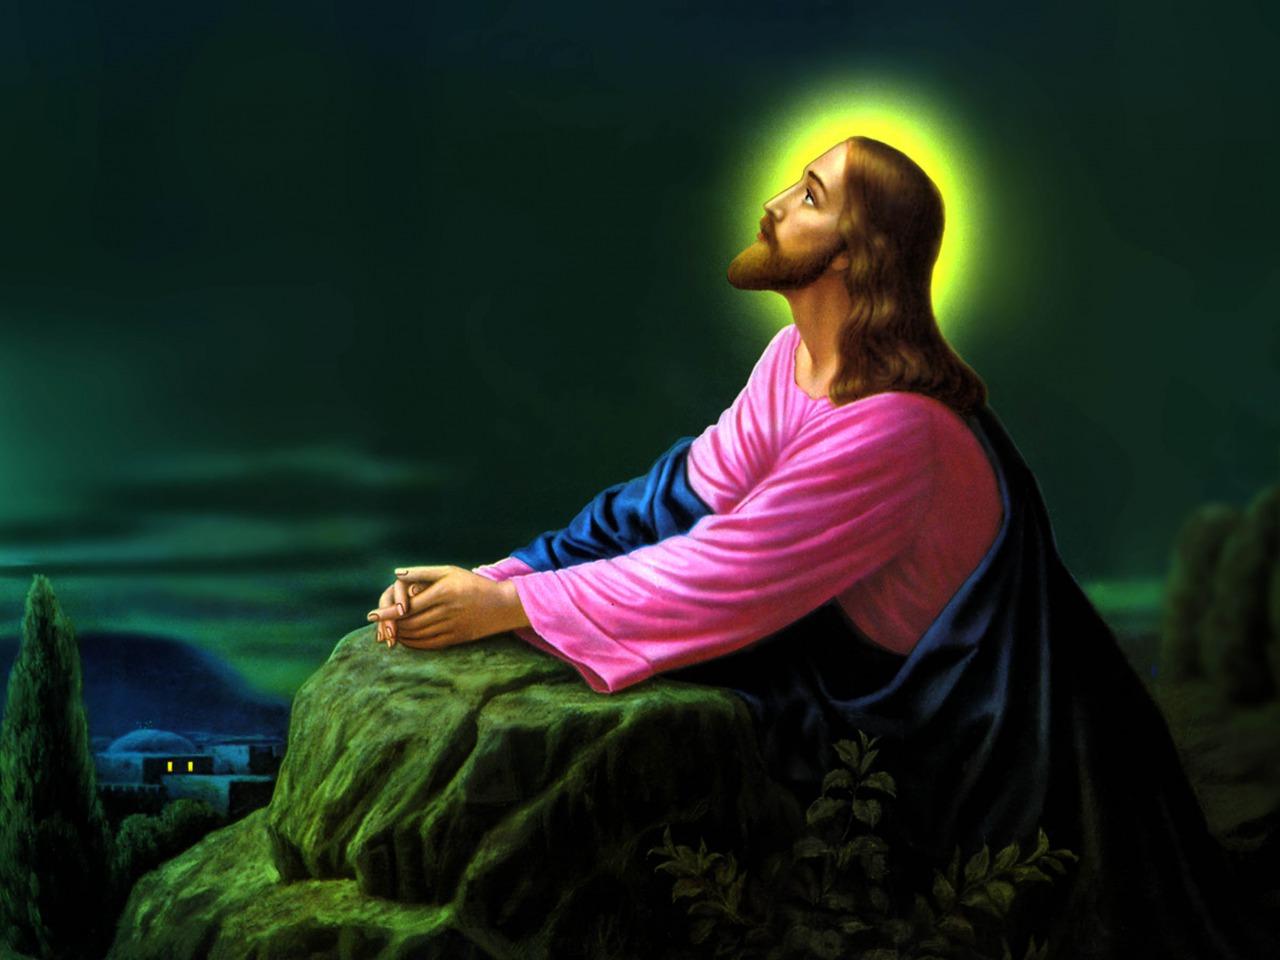 chua jesus 9